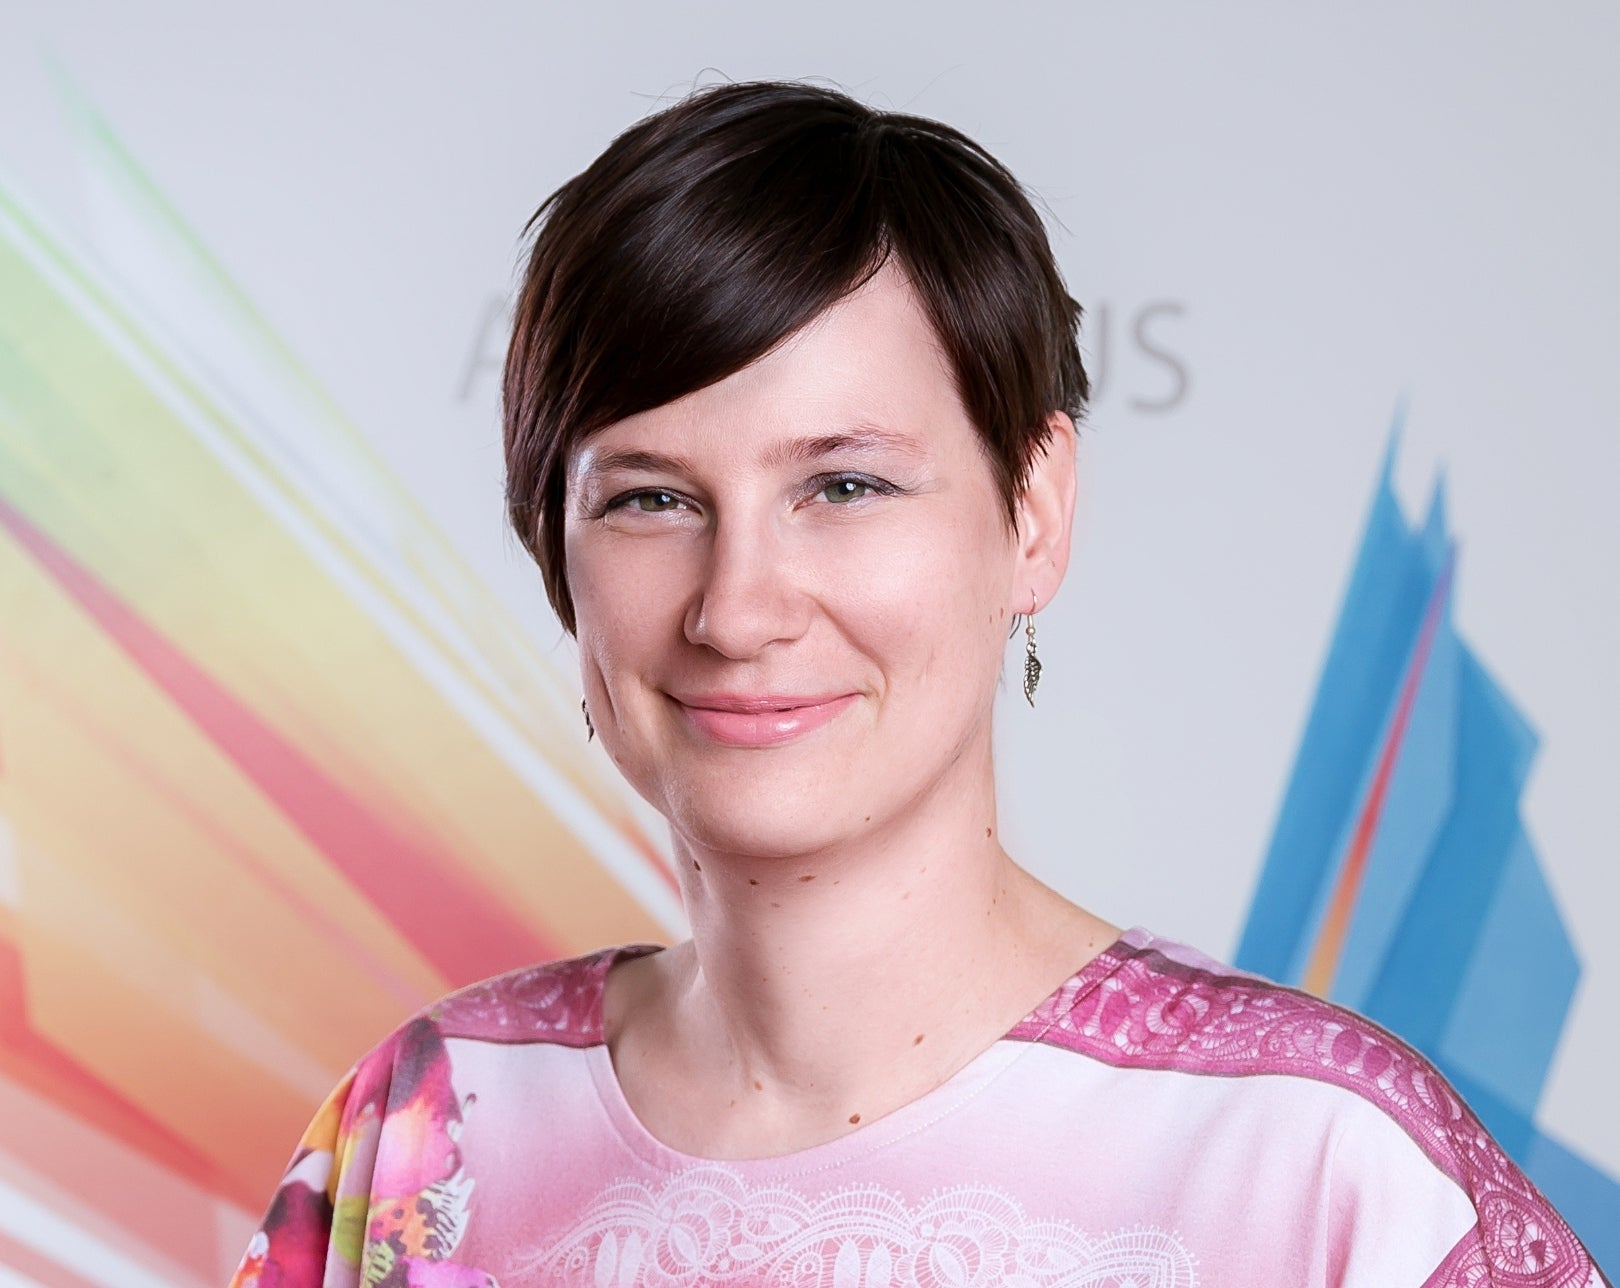 Ivana Maruševec, Planning Director, Dentsu Aegis Network Croatia